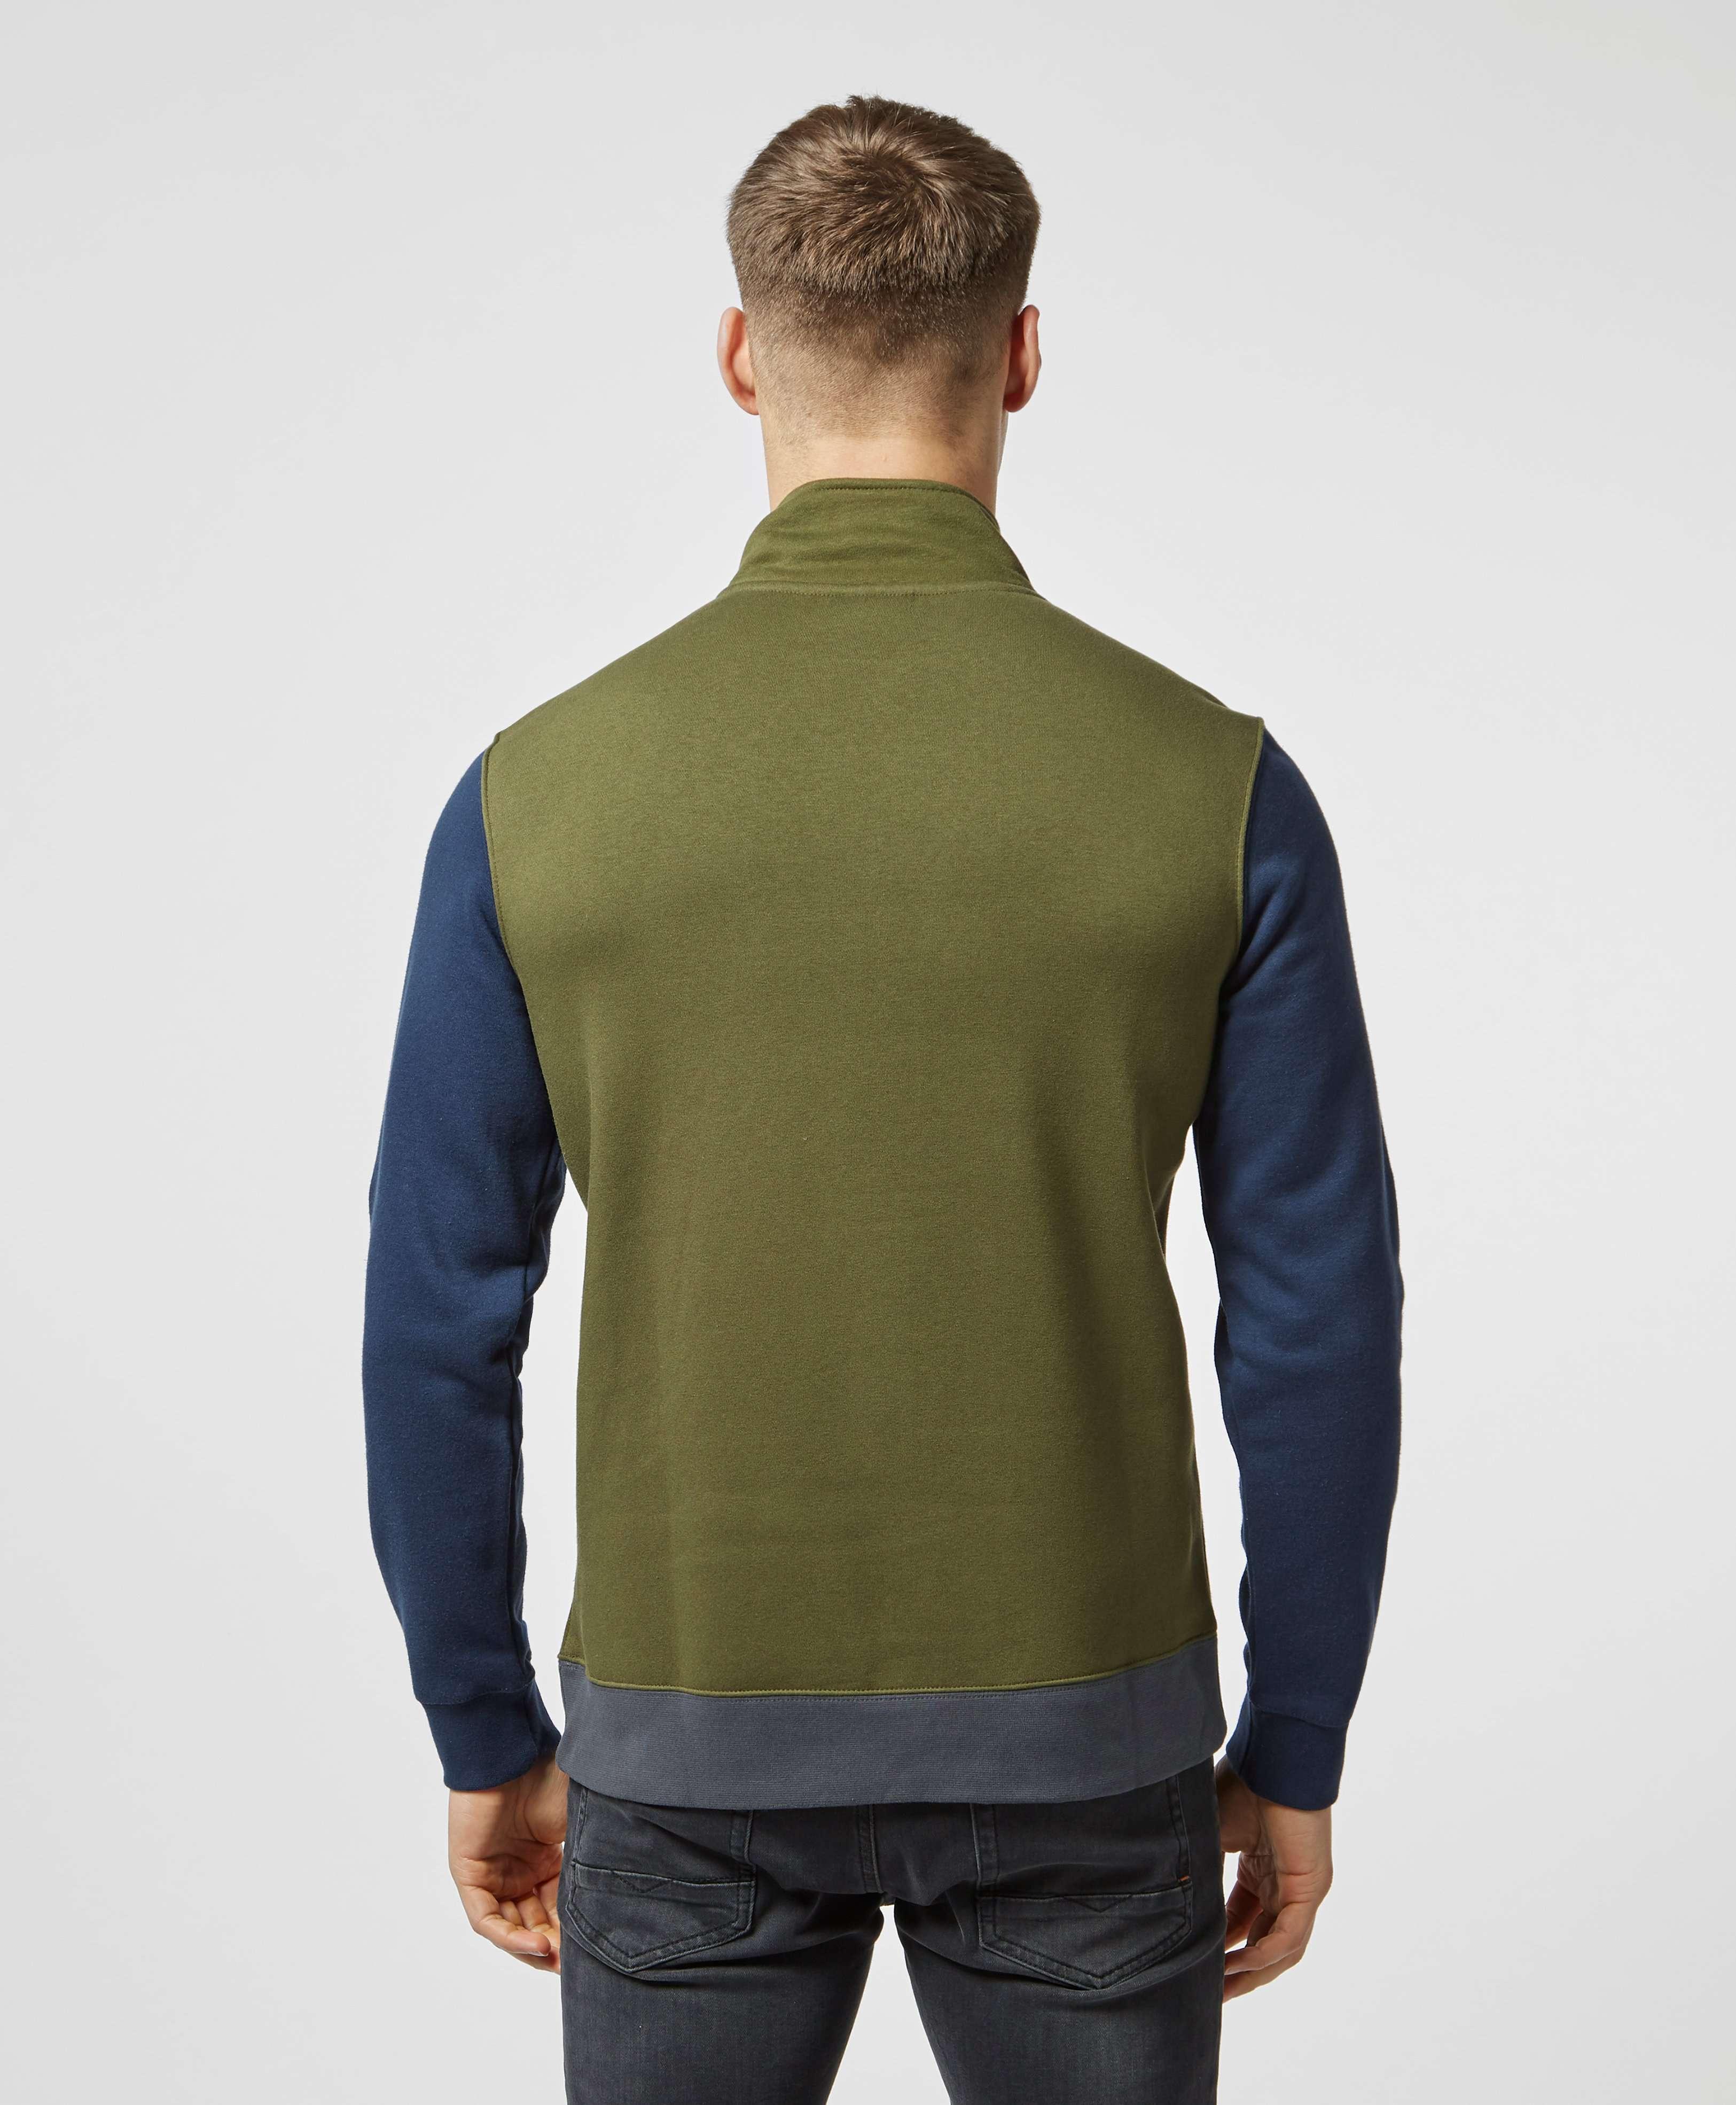 Nike Colour Block Half Zip Club Sweatshirt